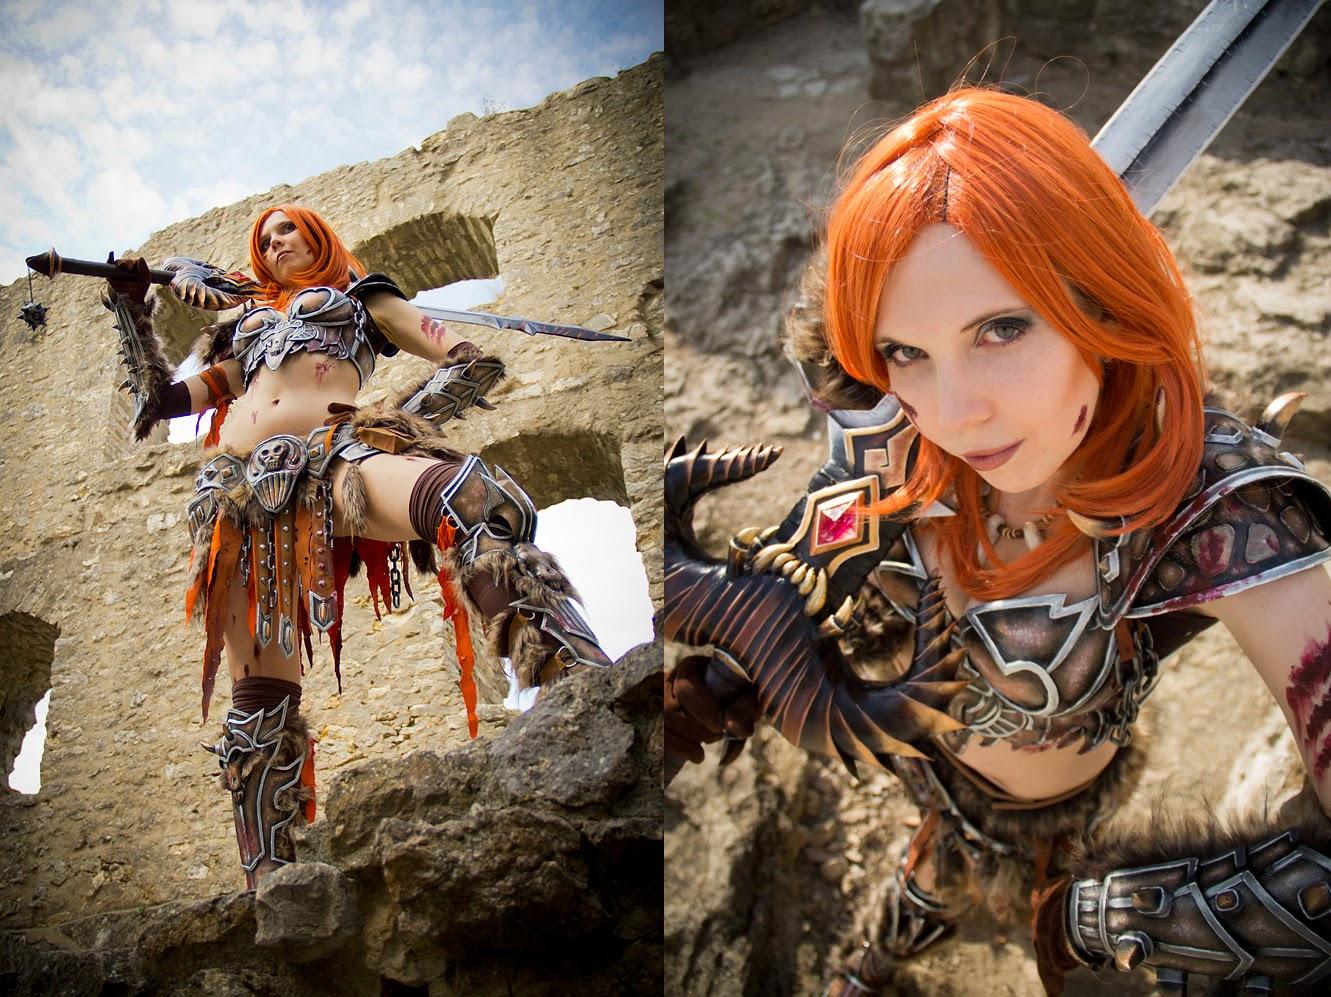 cosplay féminin très sexy d'une barbare du jeu diablo 3